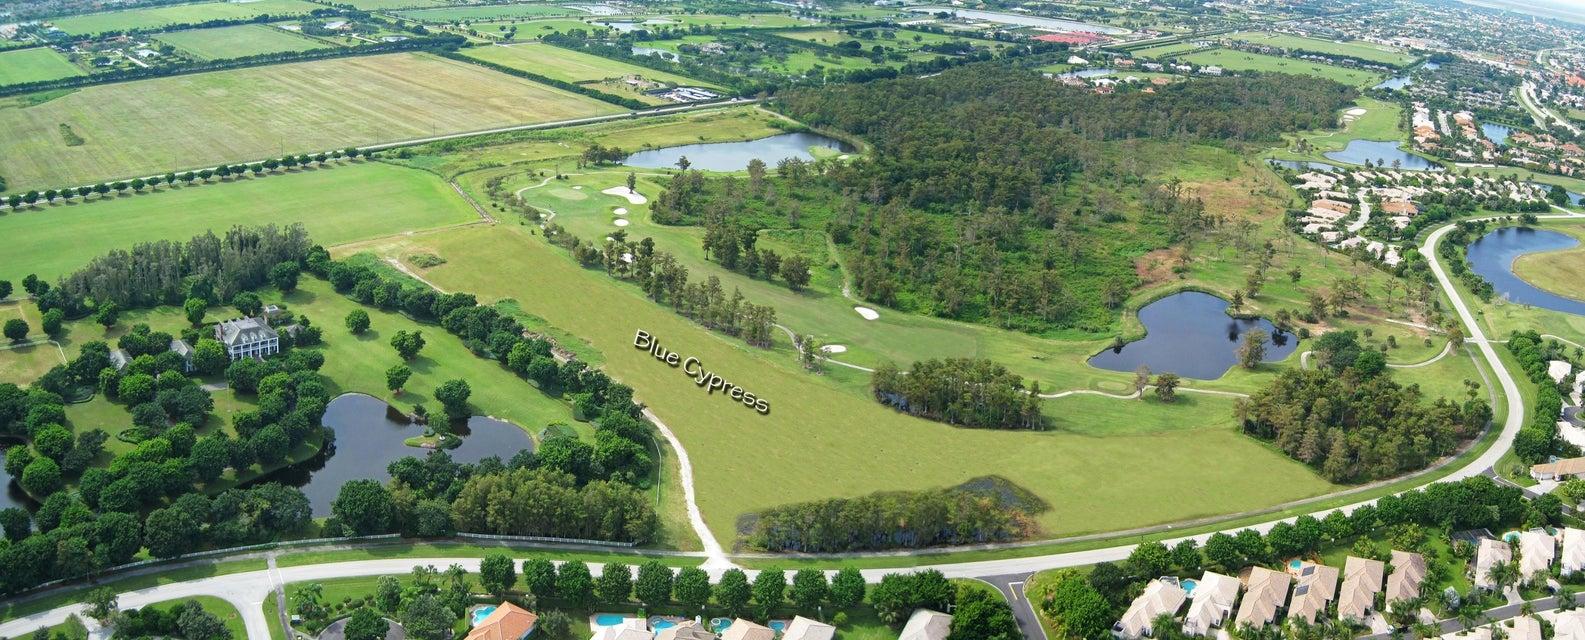 Single Family Home for Sale at 3189 Blue Cypress Lane 3189 Blue Cypress Lane Wellington, Florida 33414 United States